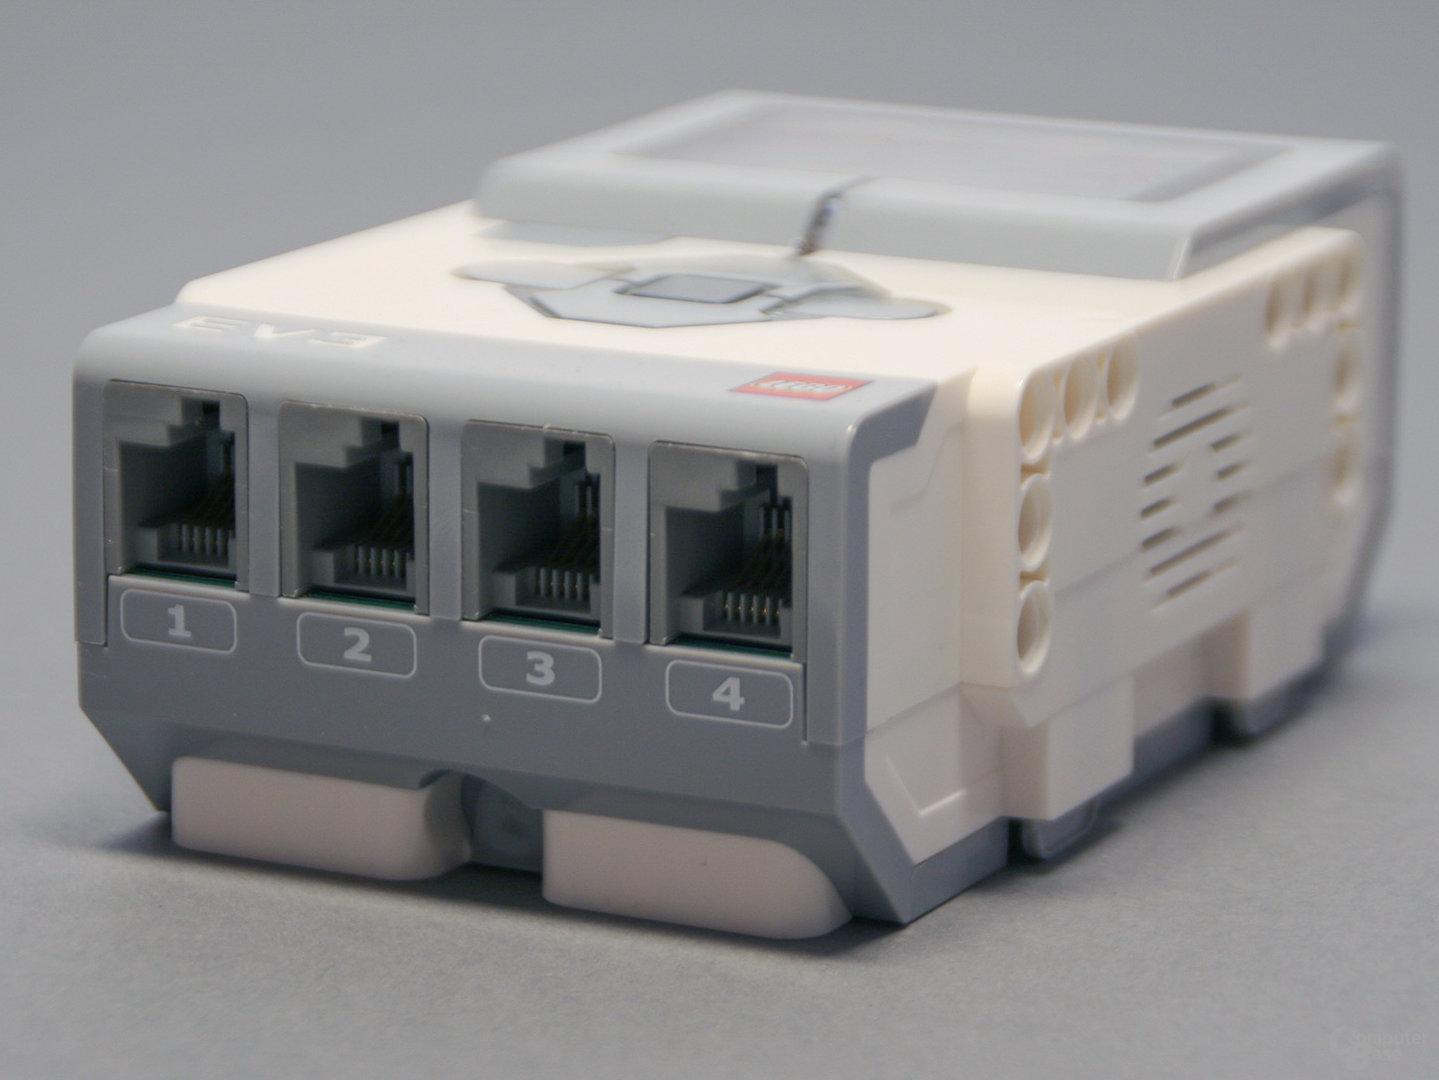 Lego-Mindstorms Brick